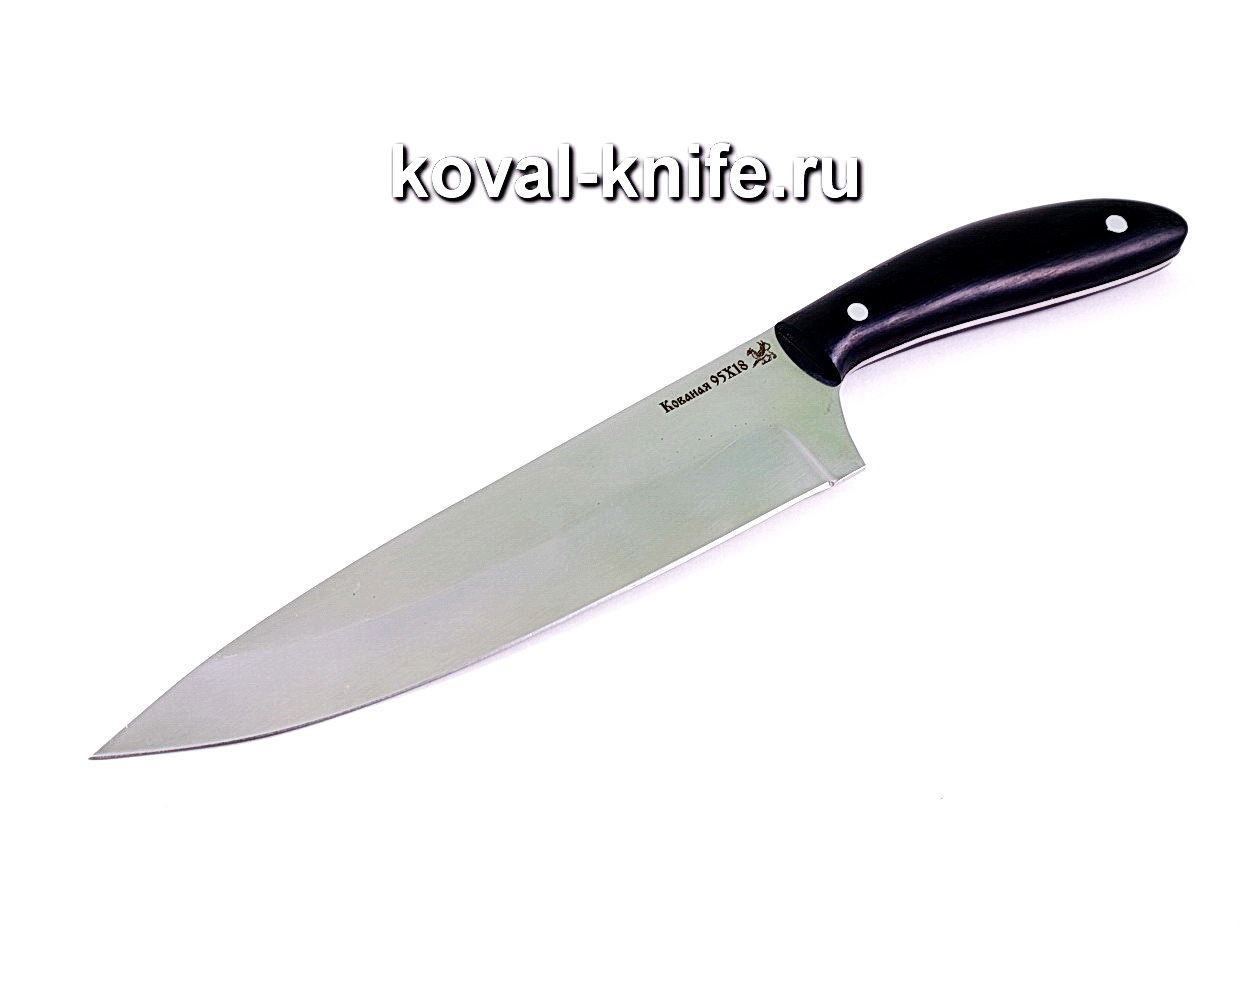 Кухонный большой нож (сталь95х18), рукоять граб A136